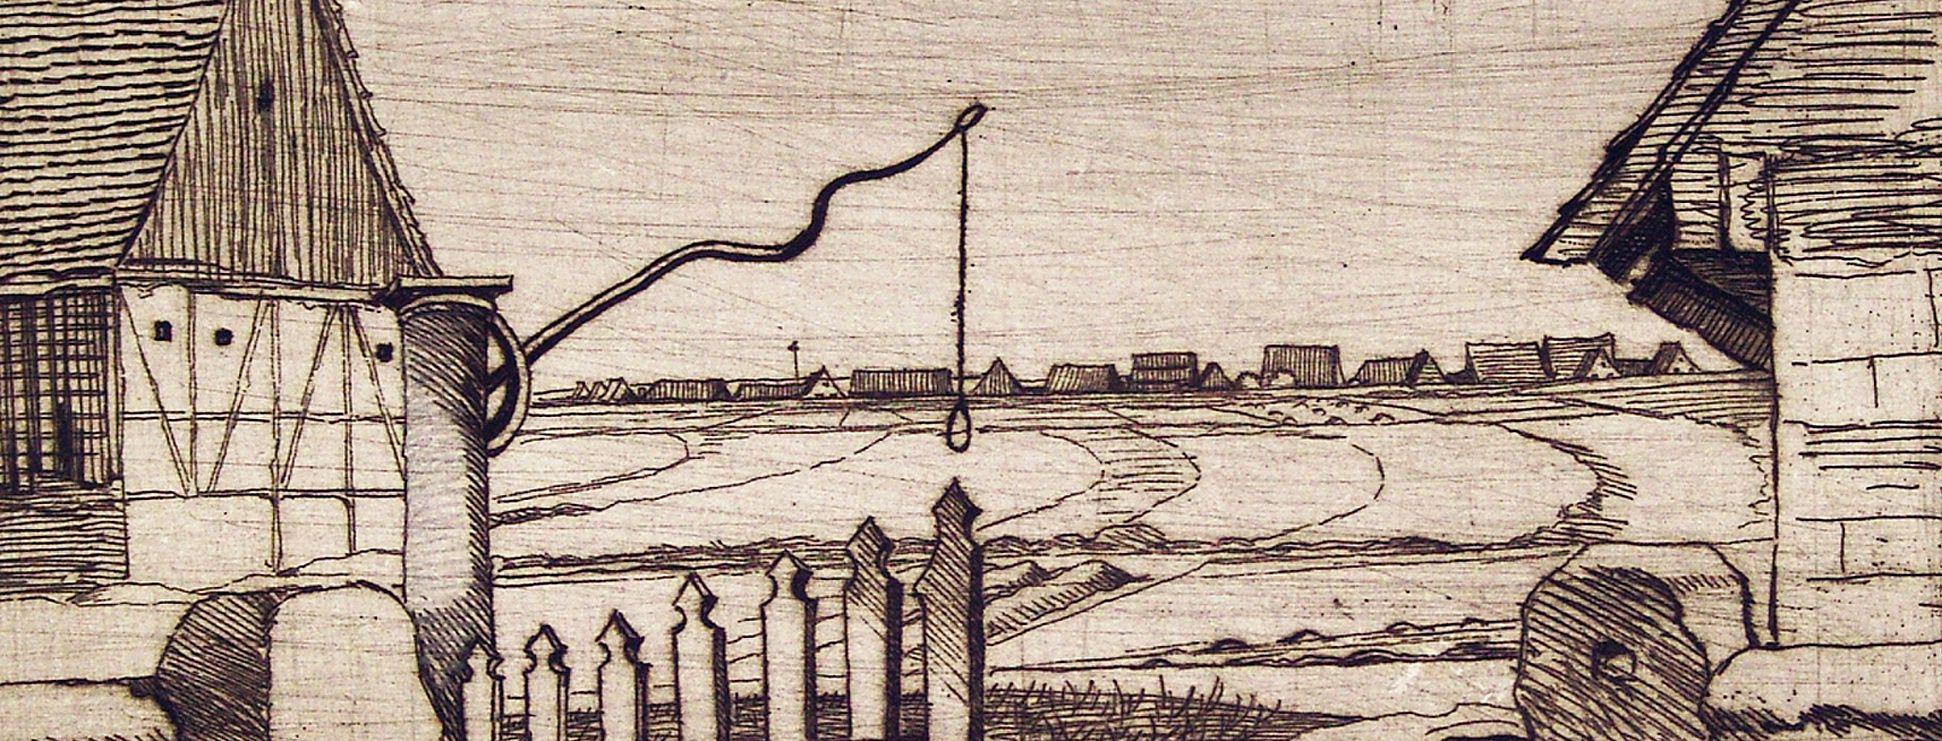 Knoblauchsland IV Detail